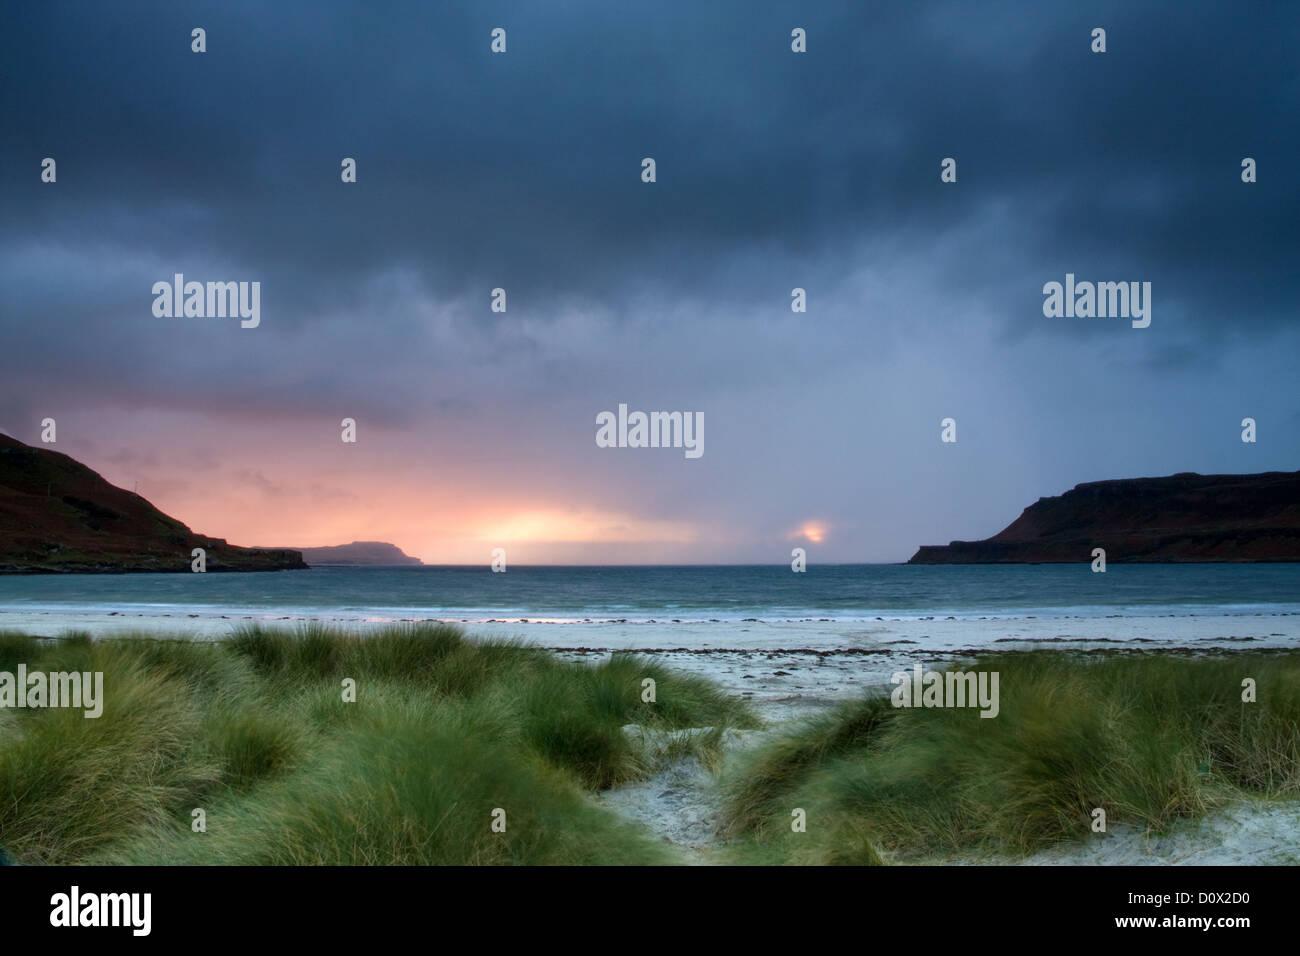 Squall, Calgary Bay, Isle of Mull - Stock Image